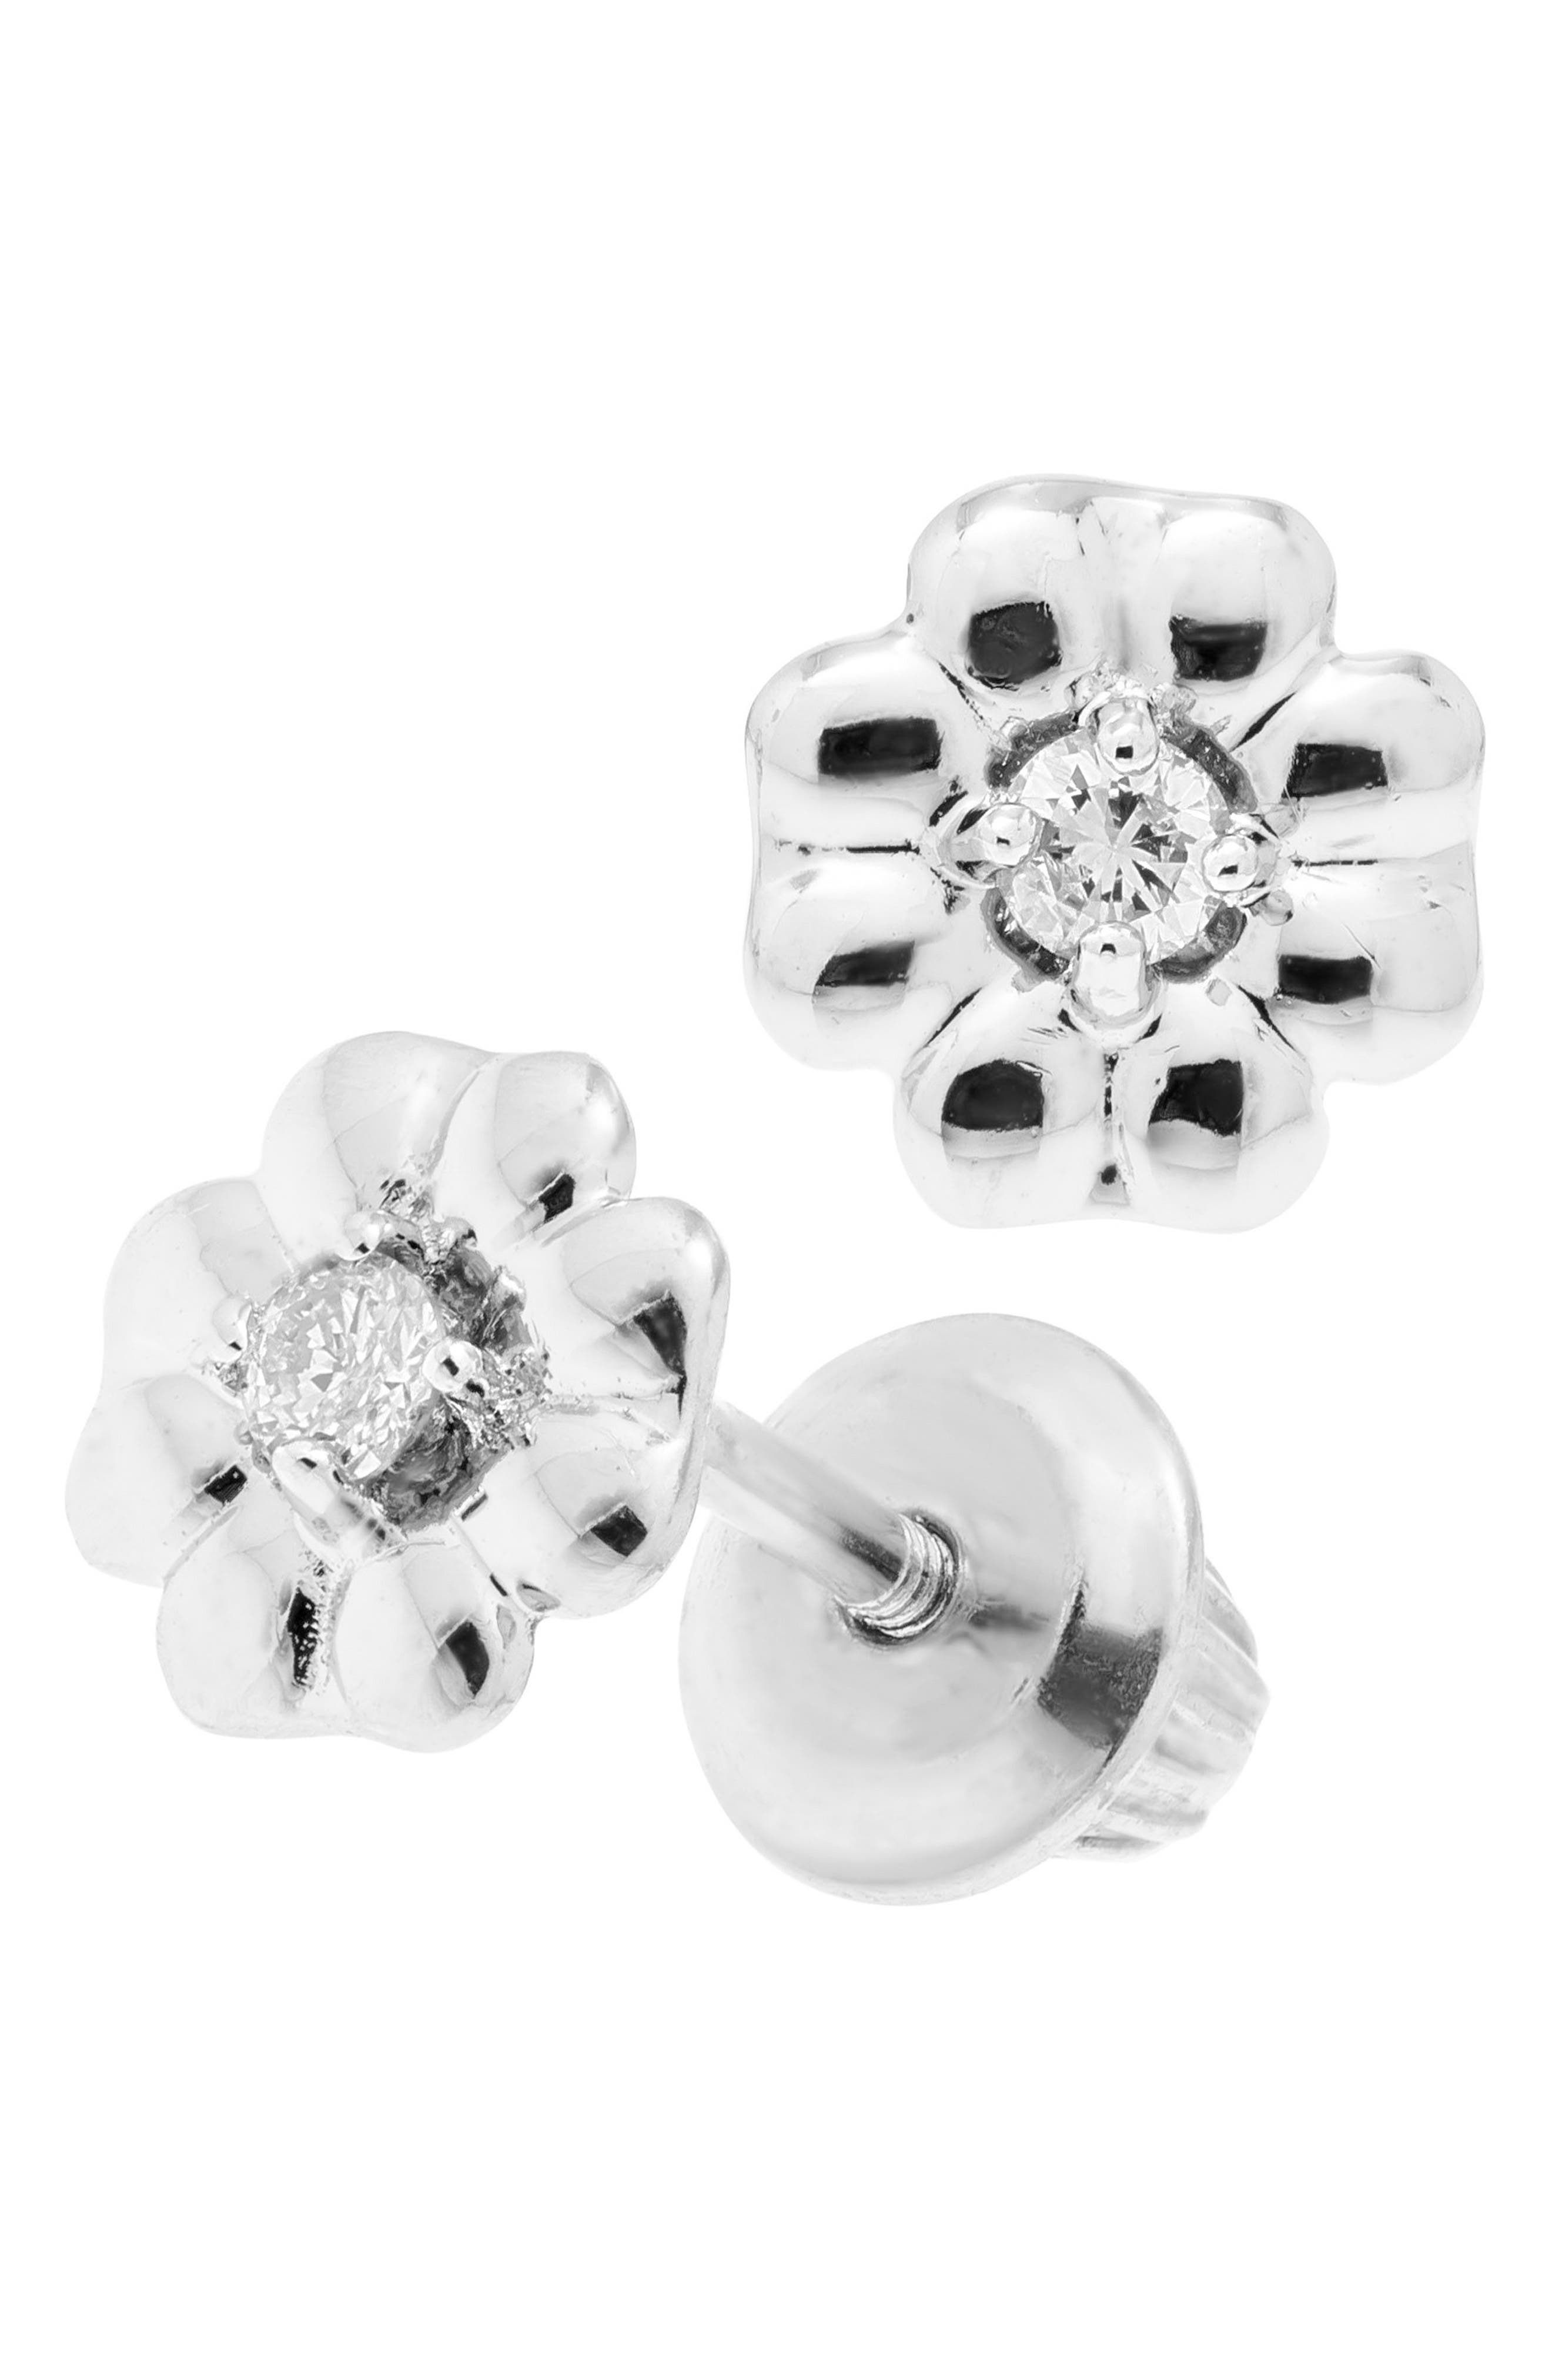 Main Image - Mignonette Sterling Silver & Diamond Stud Earrings